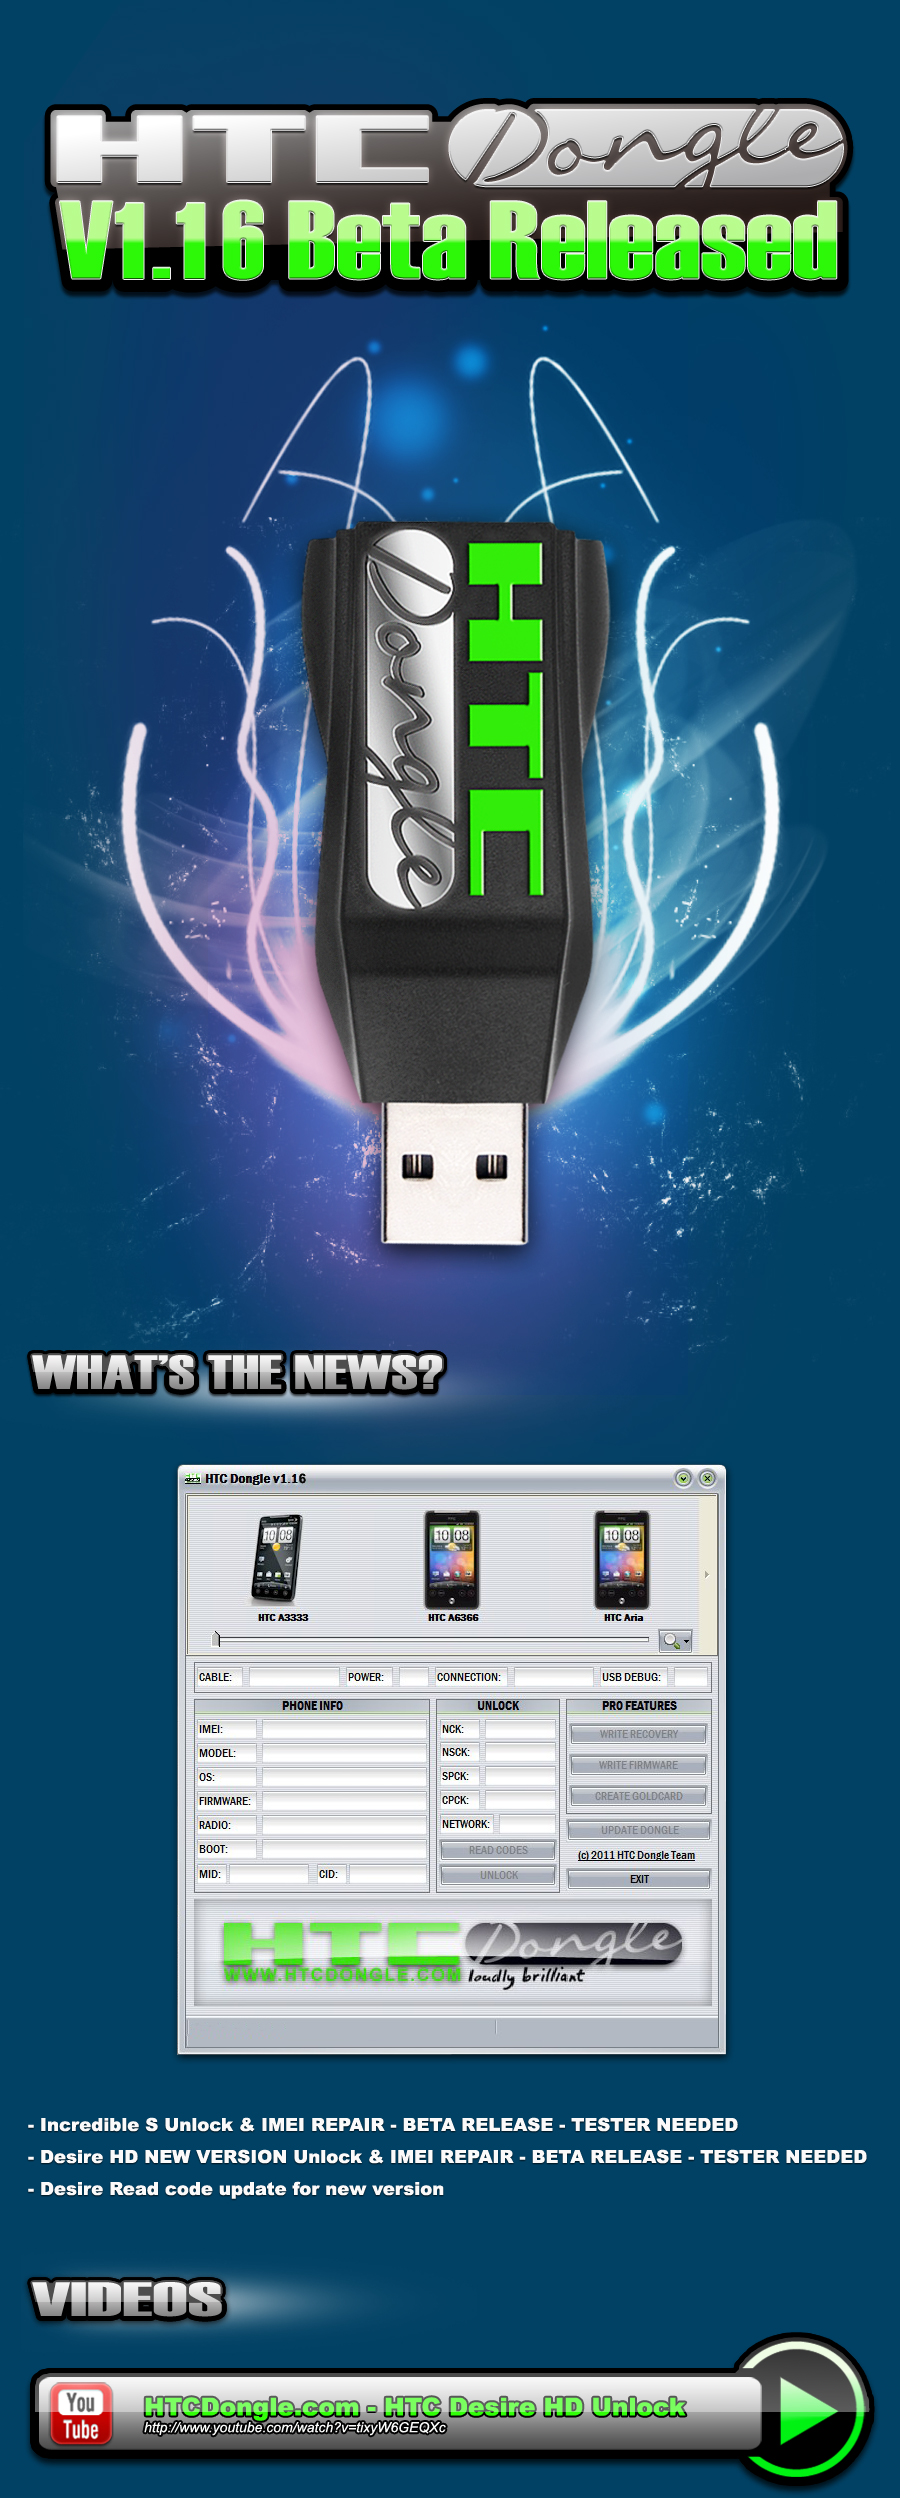 HTCDongle 1.16Beta Released! HTCDesire HD & Incredible S added!